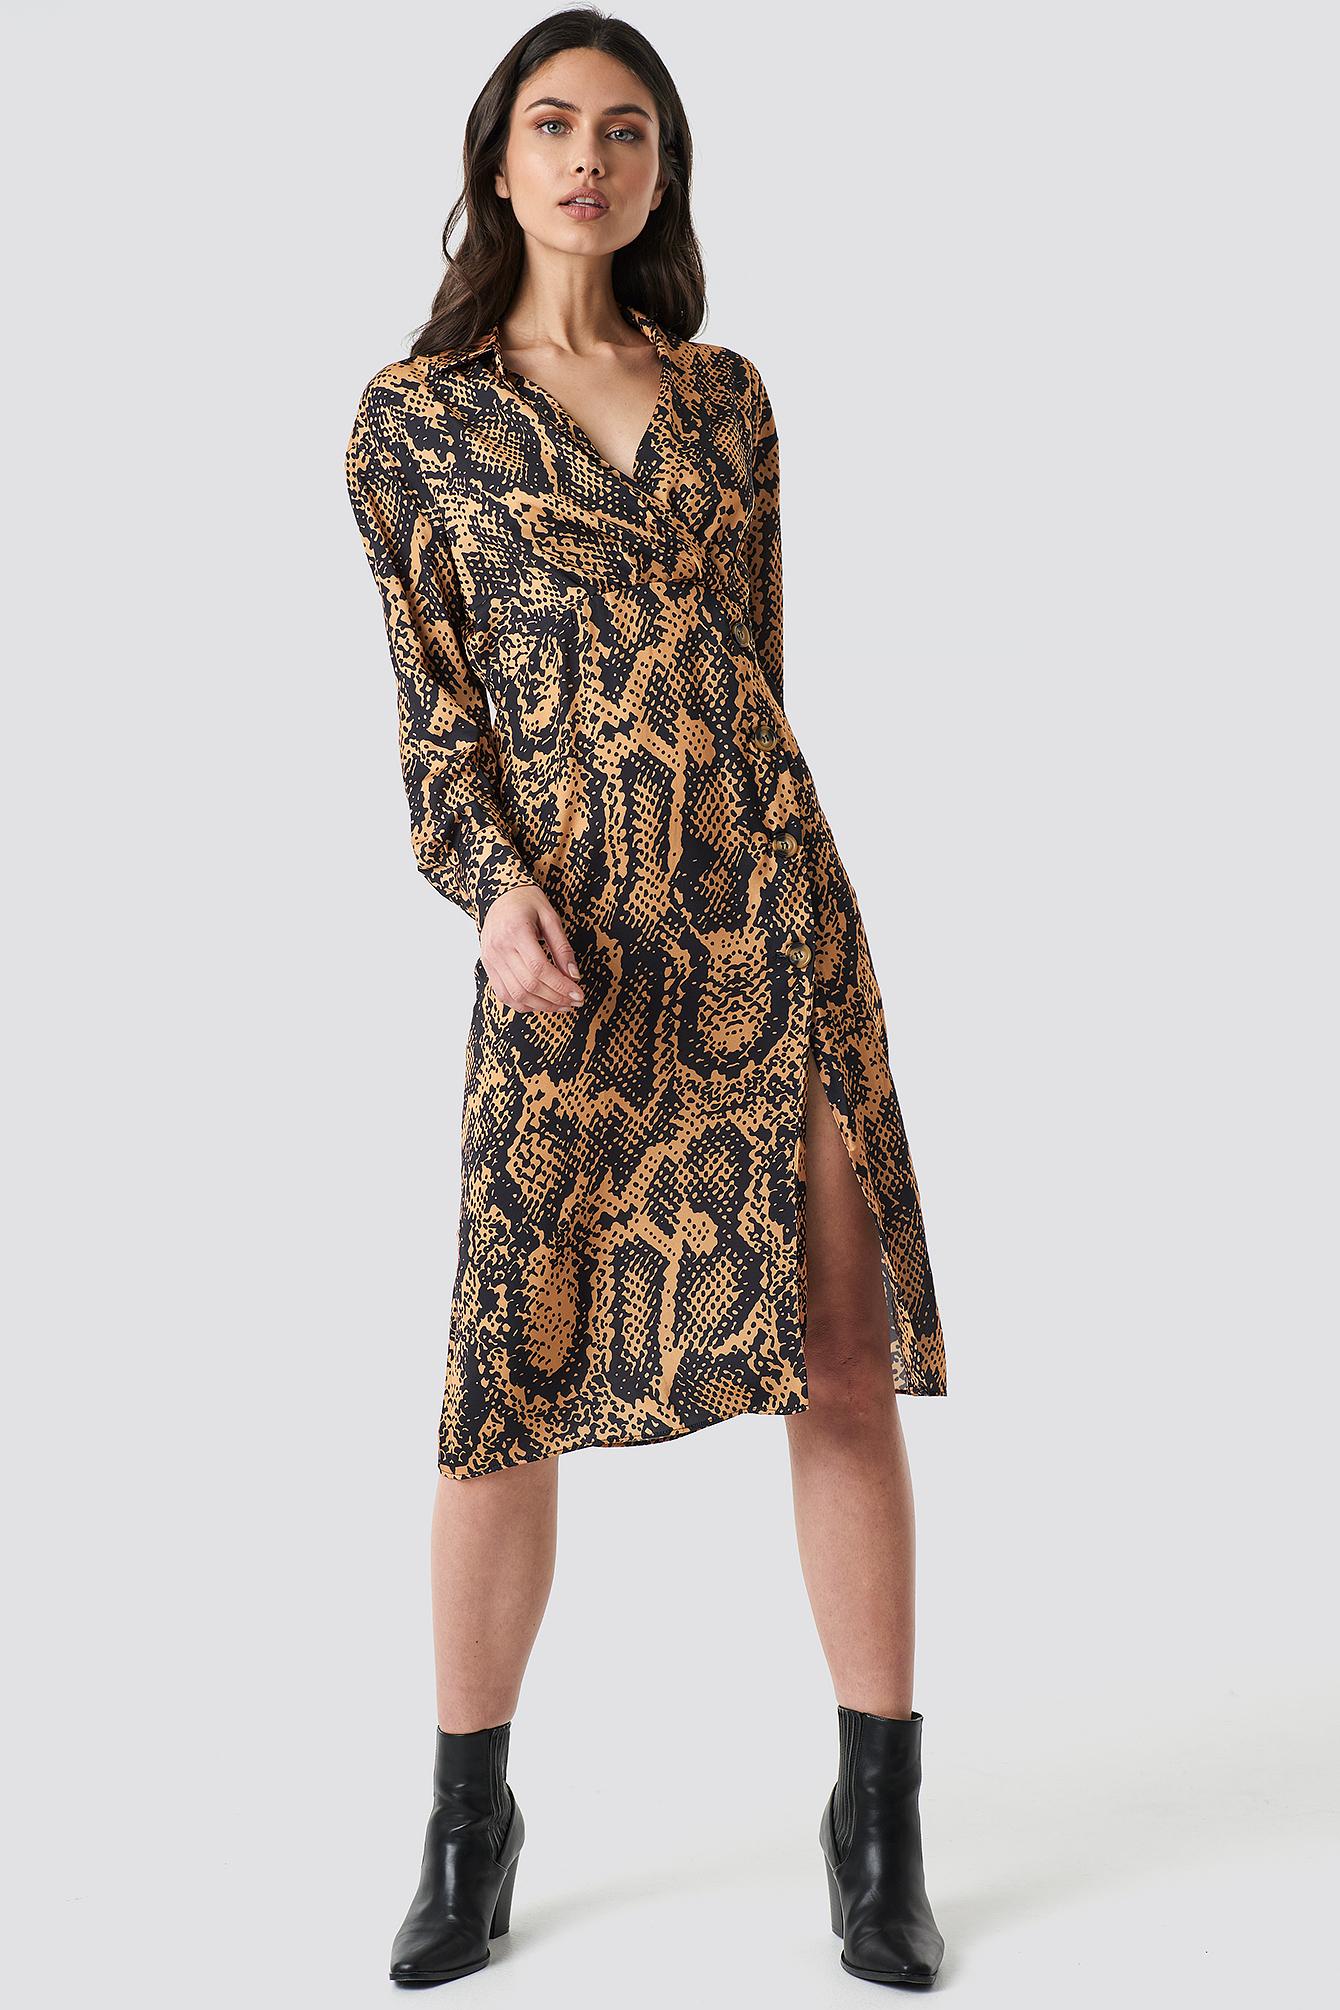 trendyol -  Snake Patterned Midi Dress - Orange